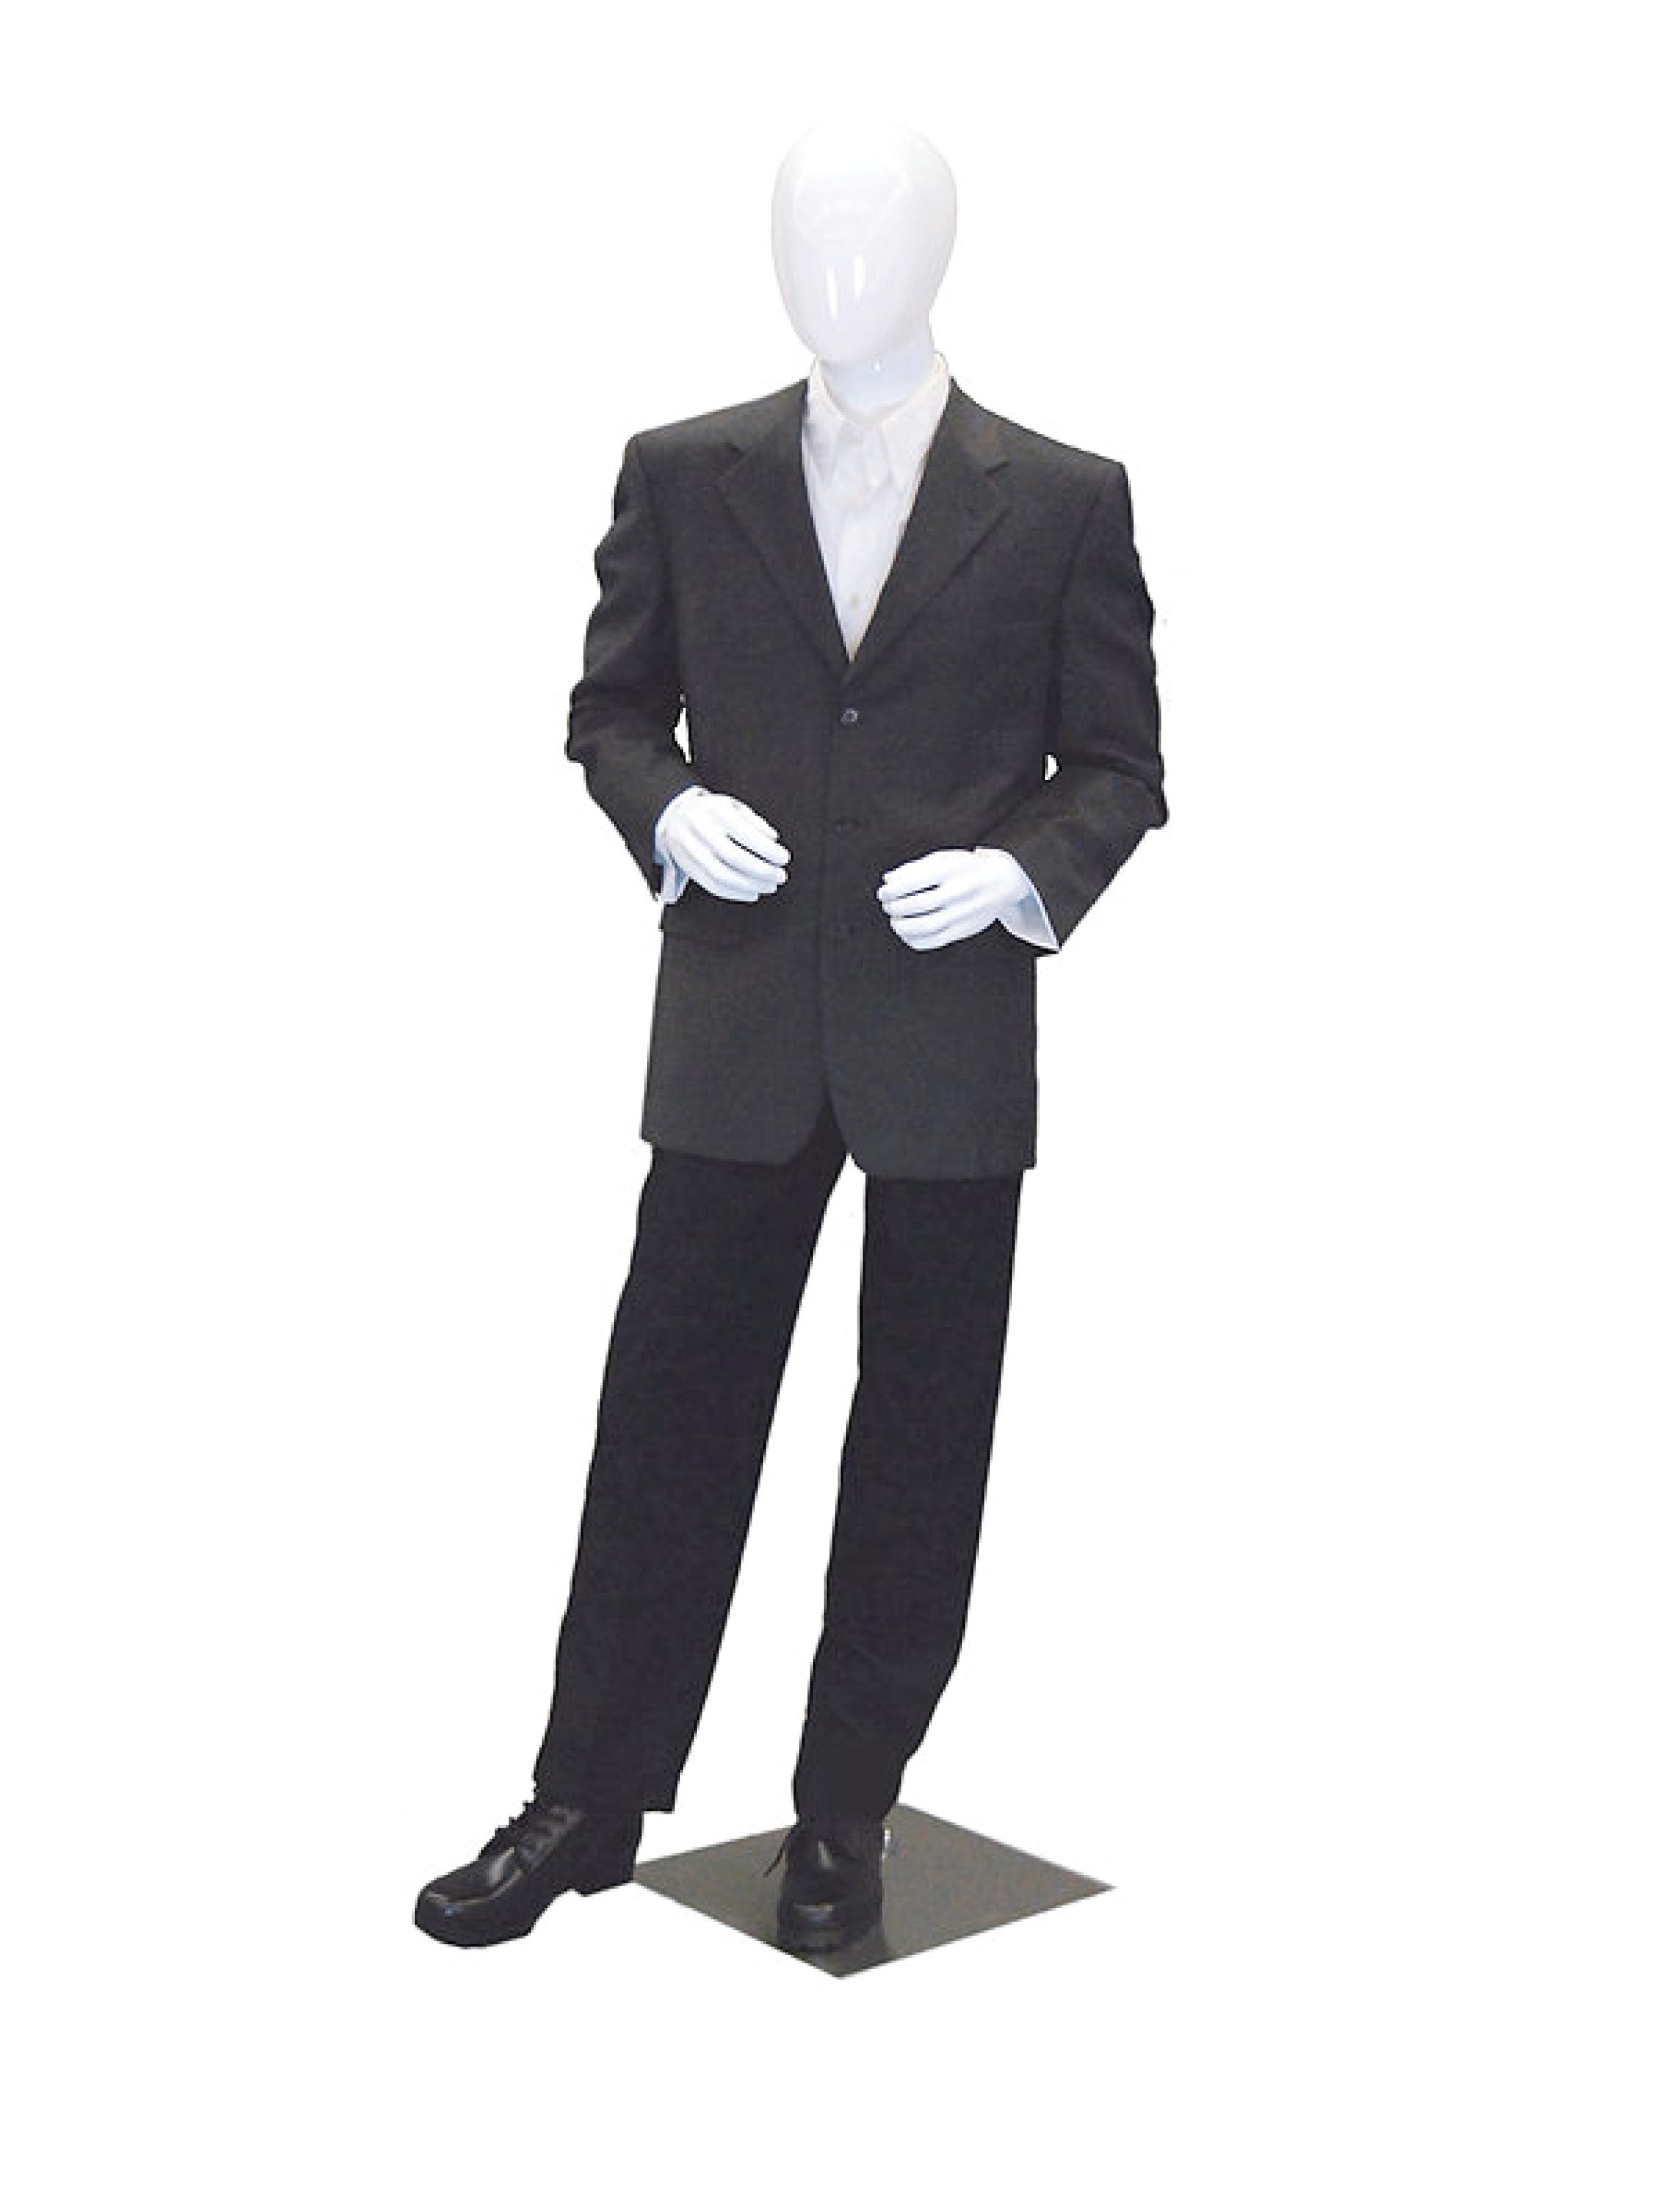 Male Mannequin - Mannequin, Transparent background PNG HD thumbnail